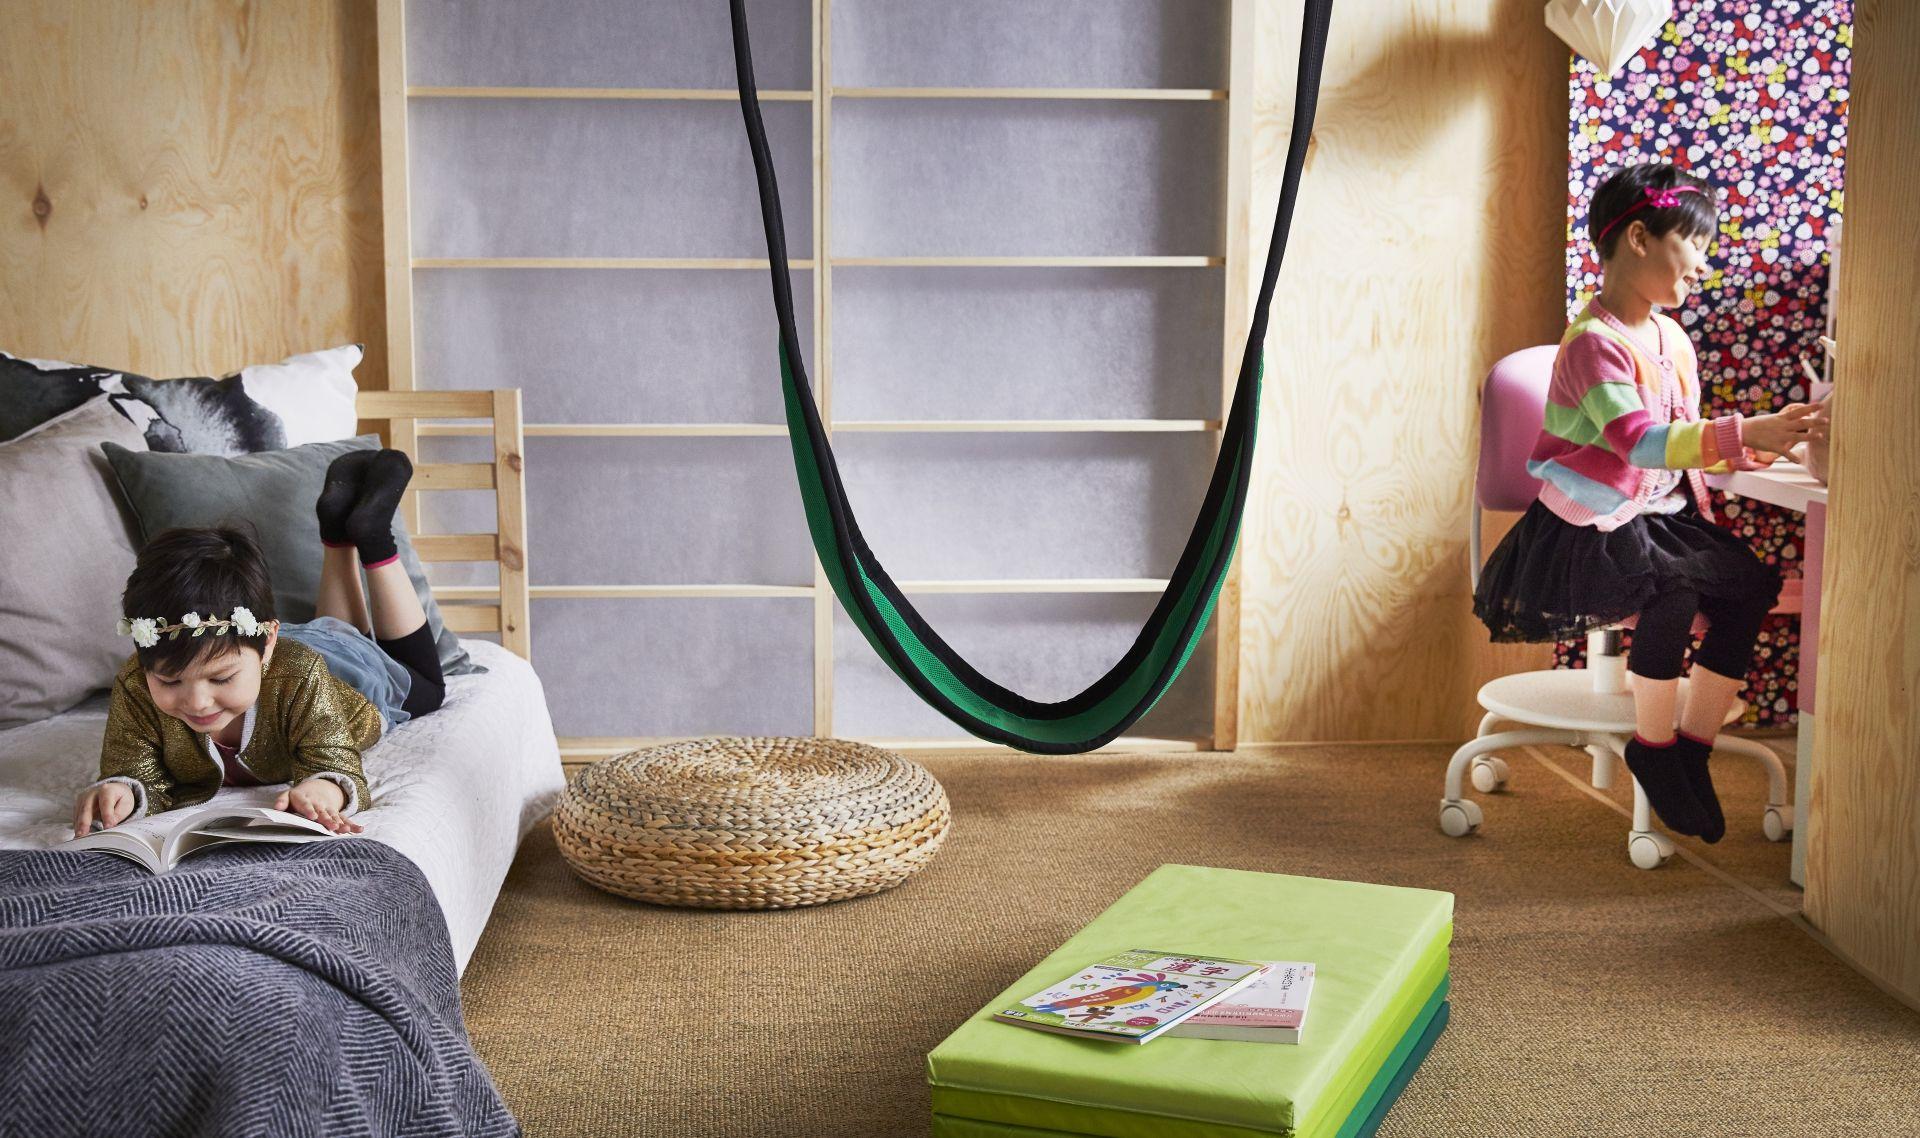 Baby Stoel Ikea : Gunggung schommel ikea ikeanl ikeanederland kinderen kids kind